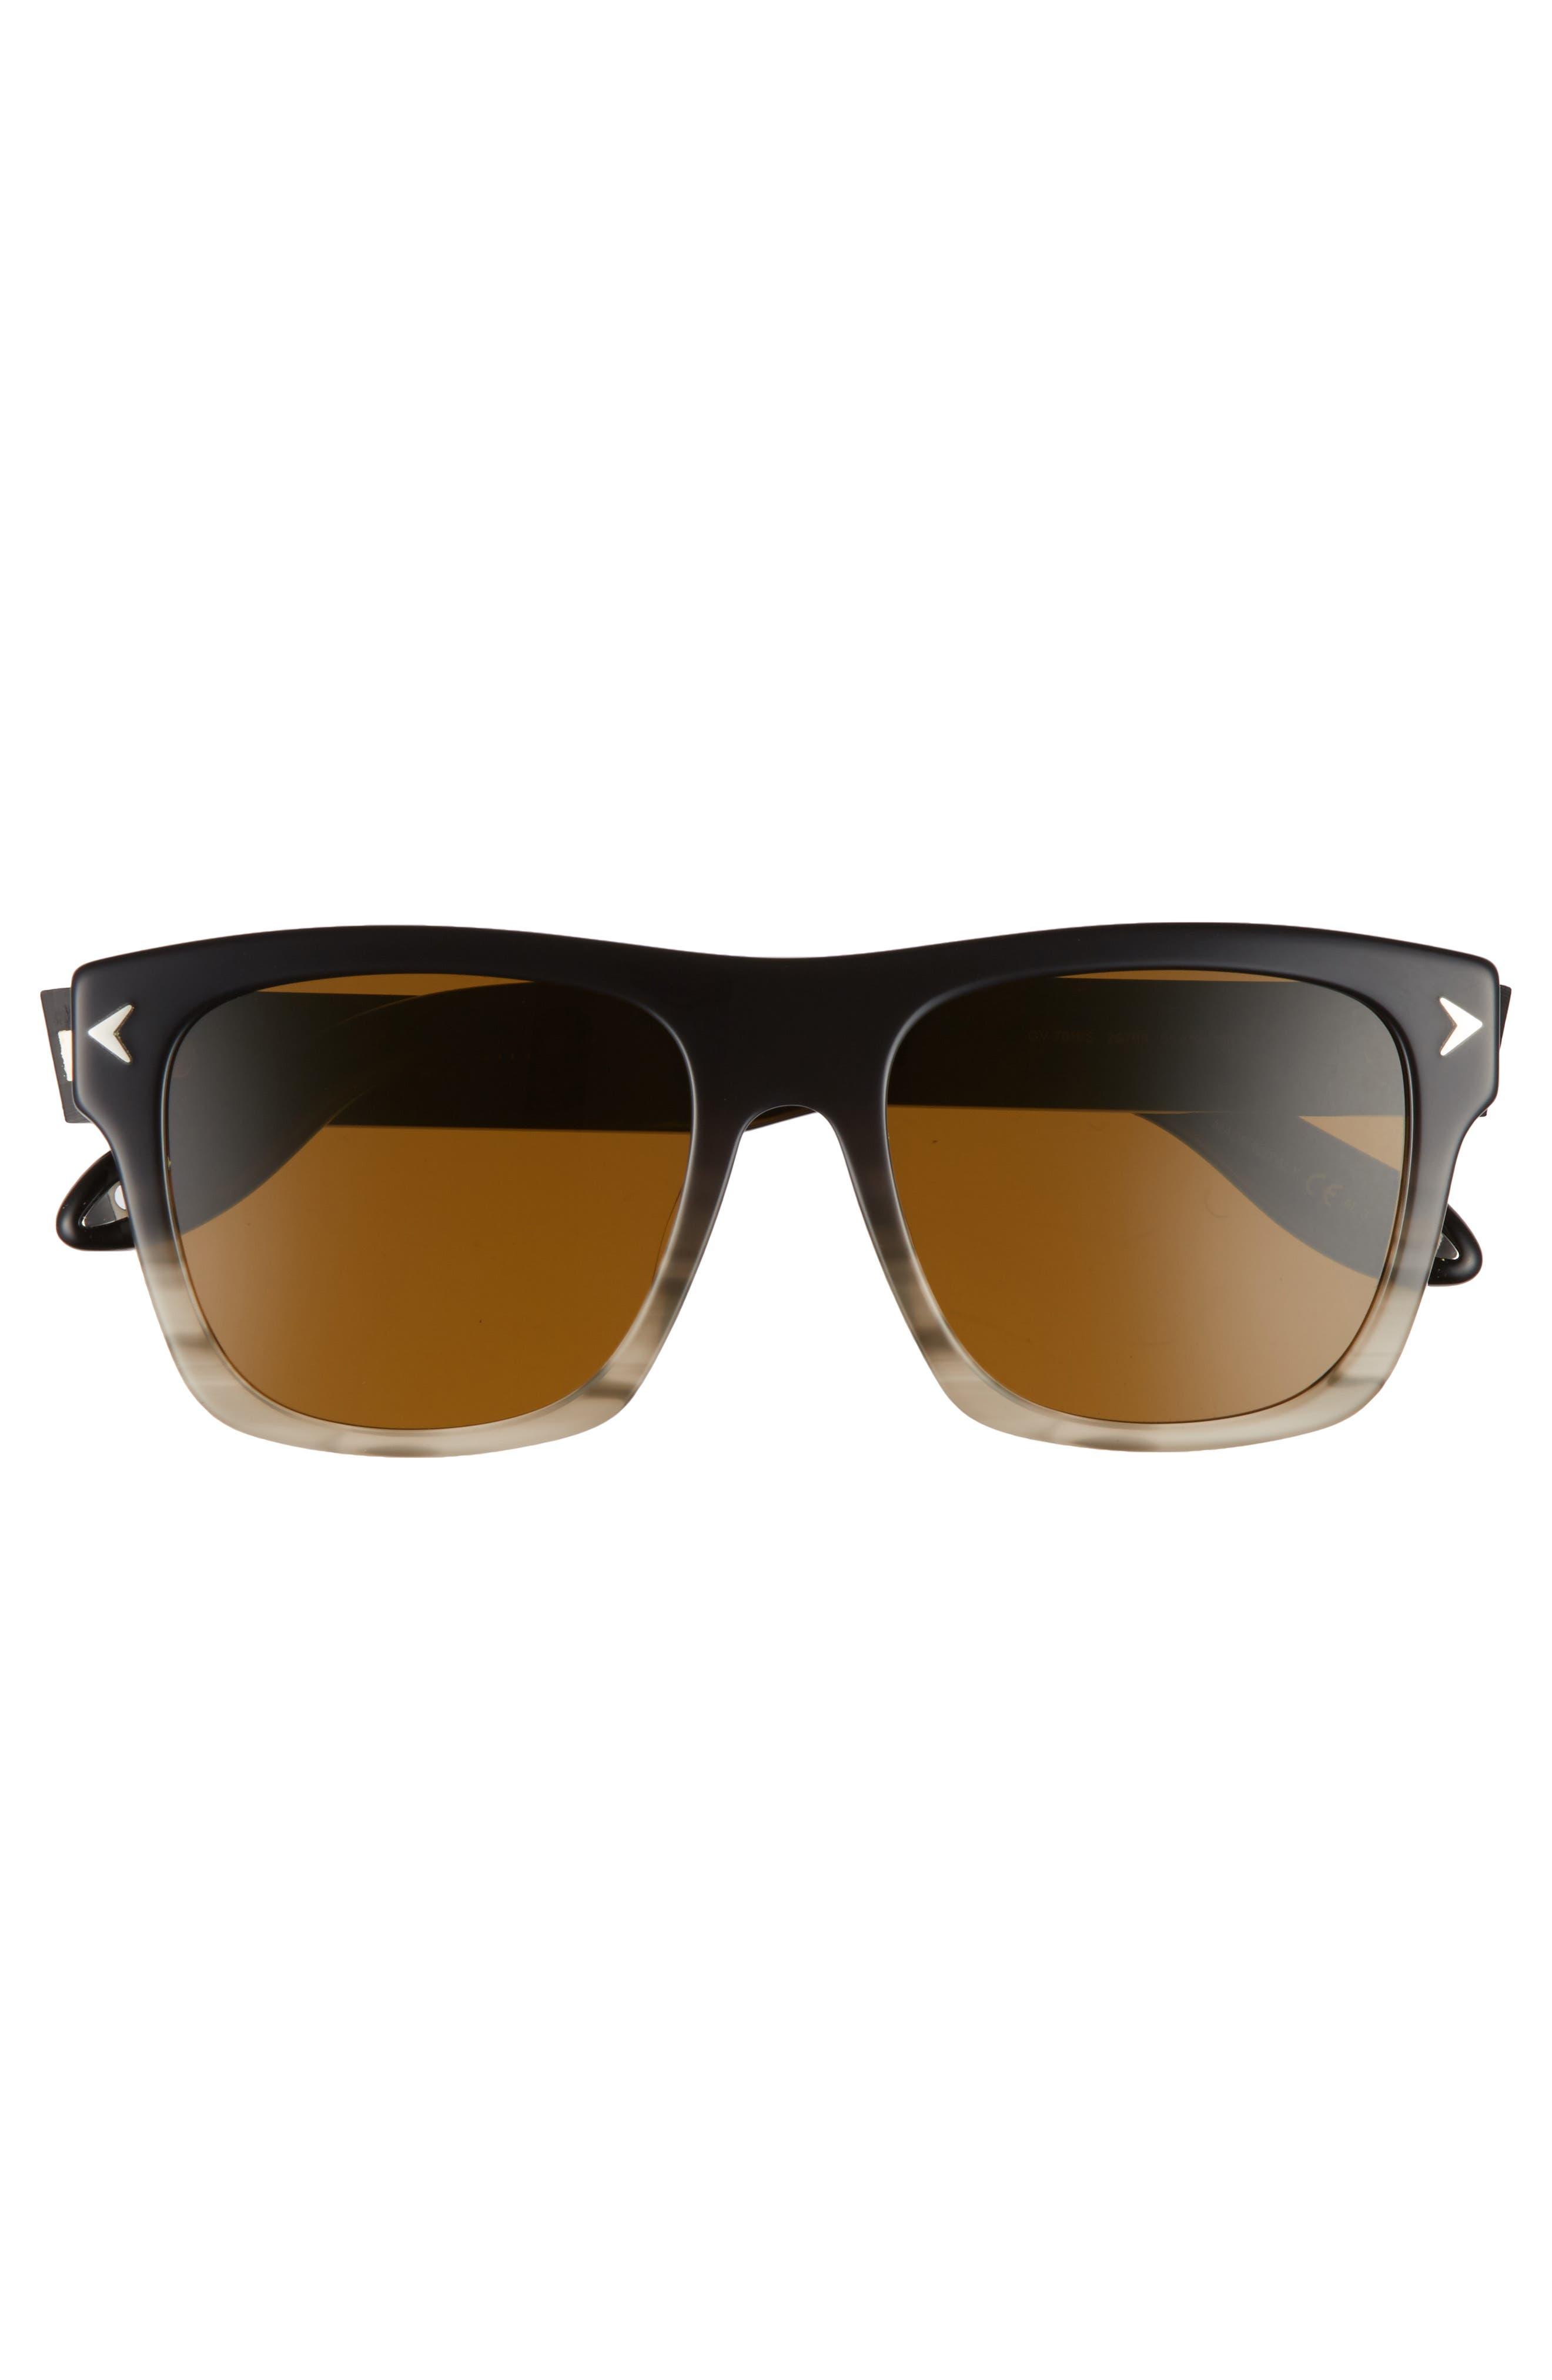 55mm Square Sunglasses,                             Alternate thumbnail 3, color,                             020